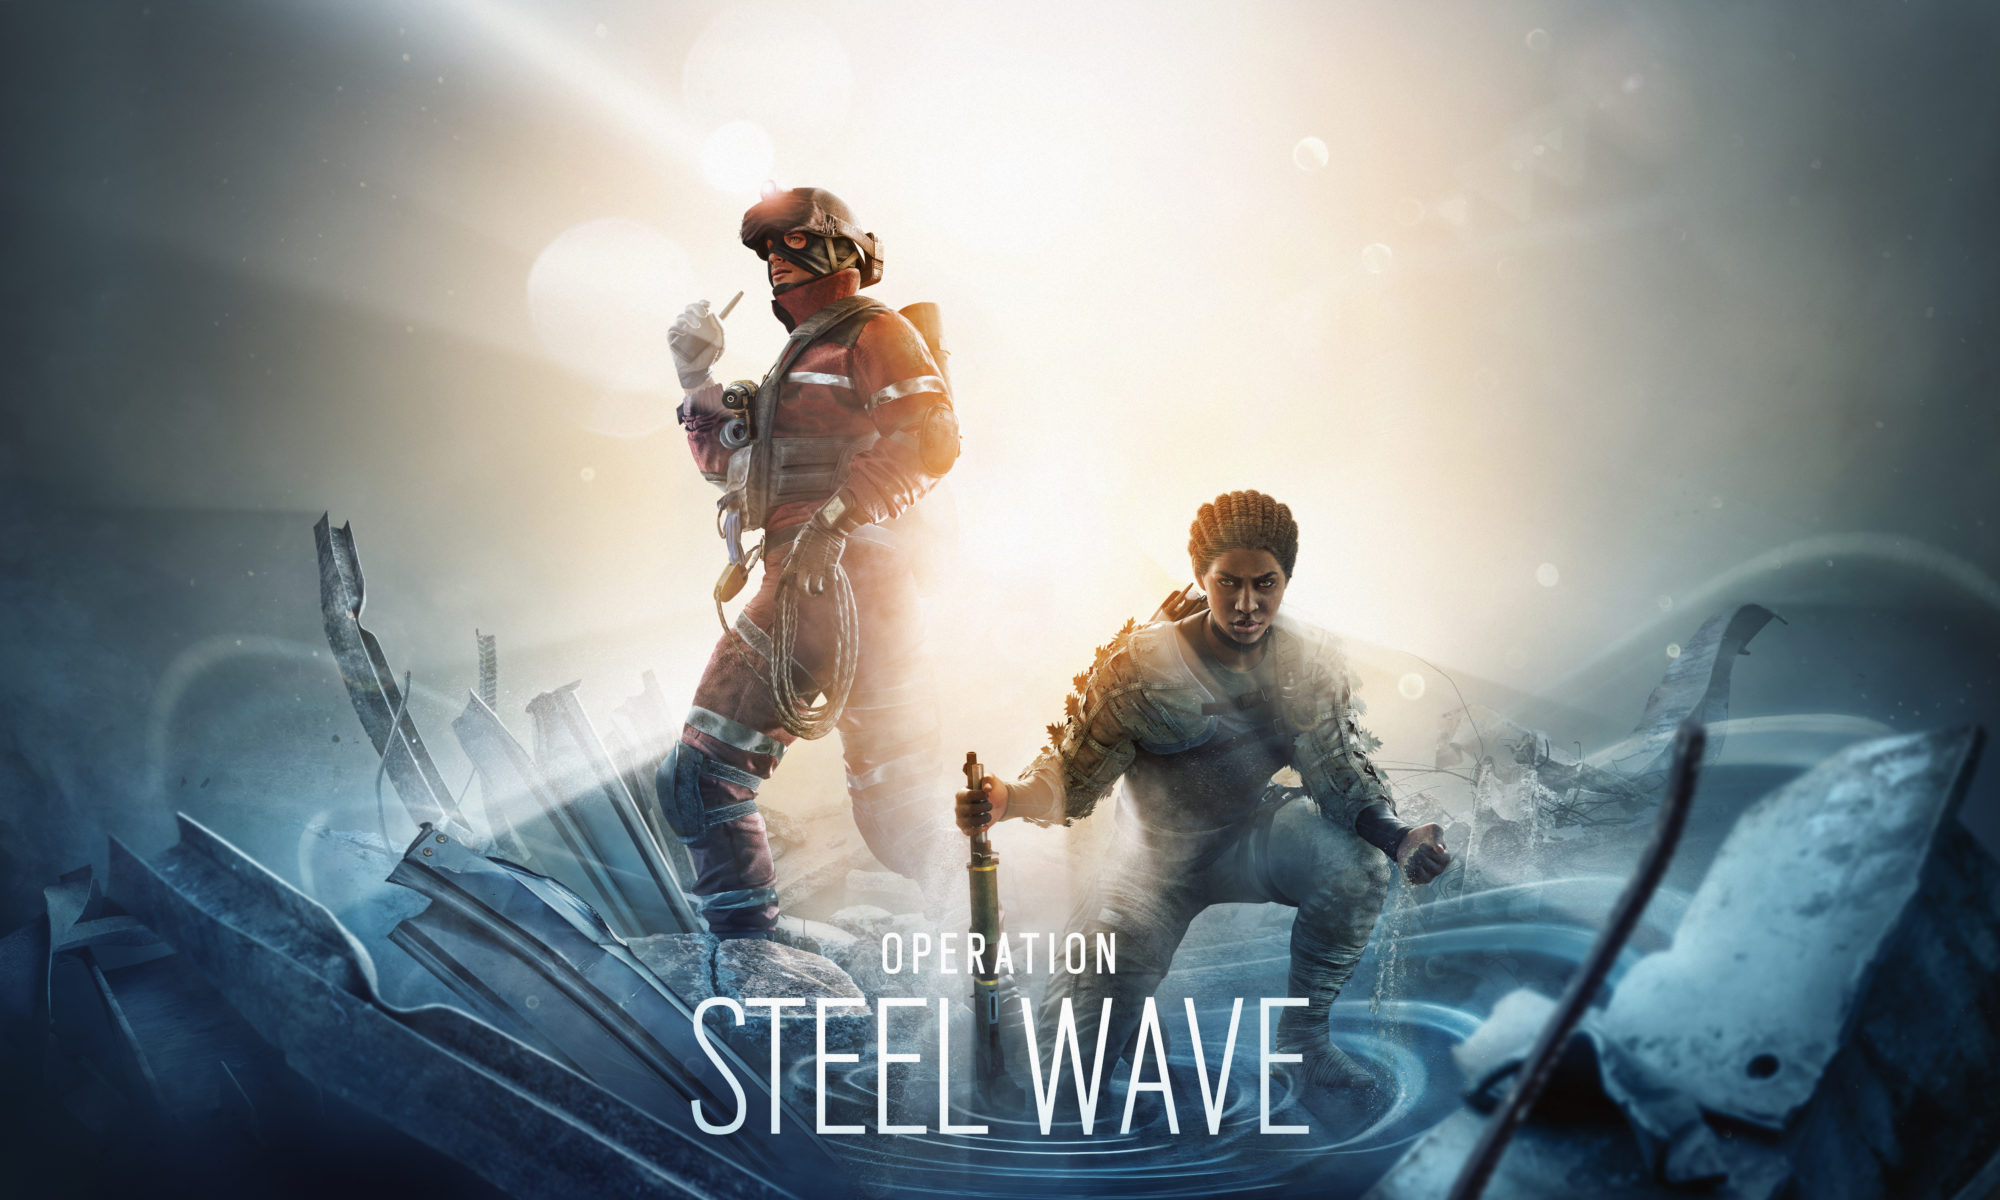 Operation Steel Wave